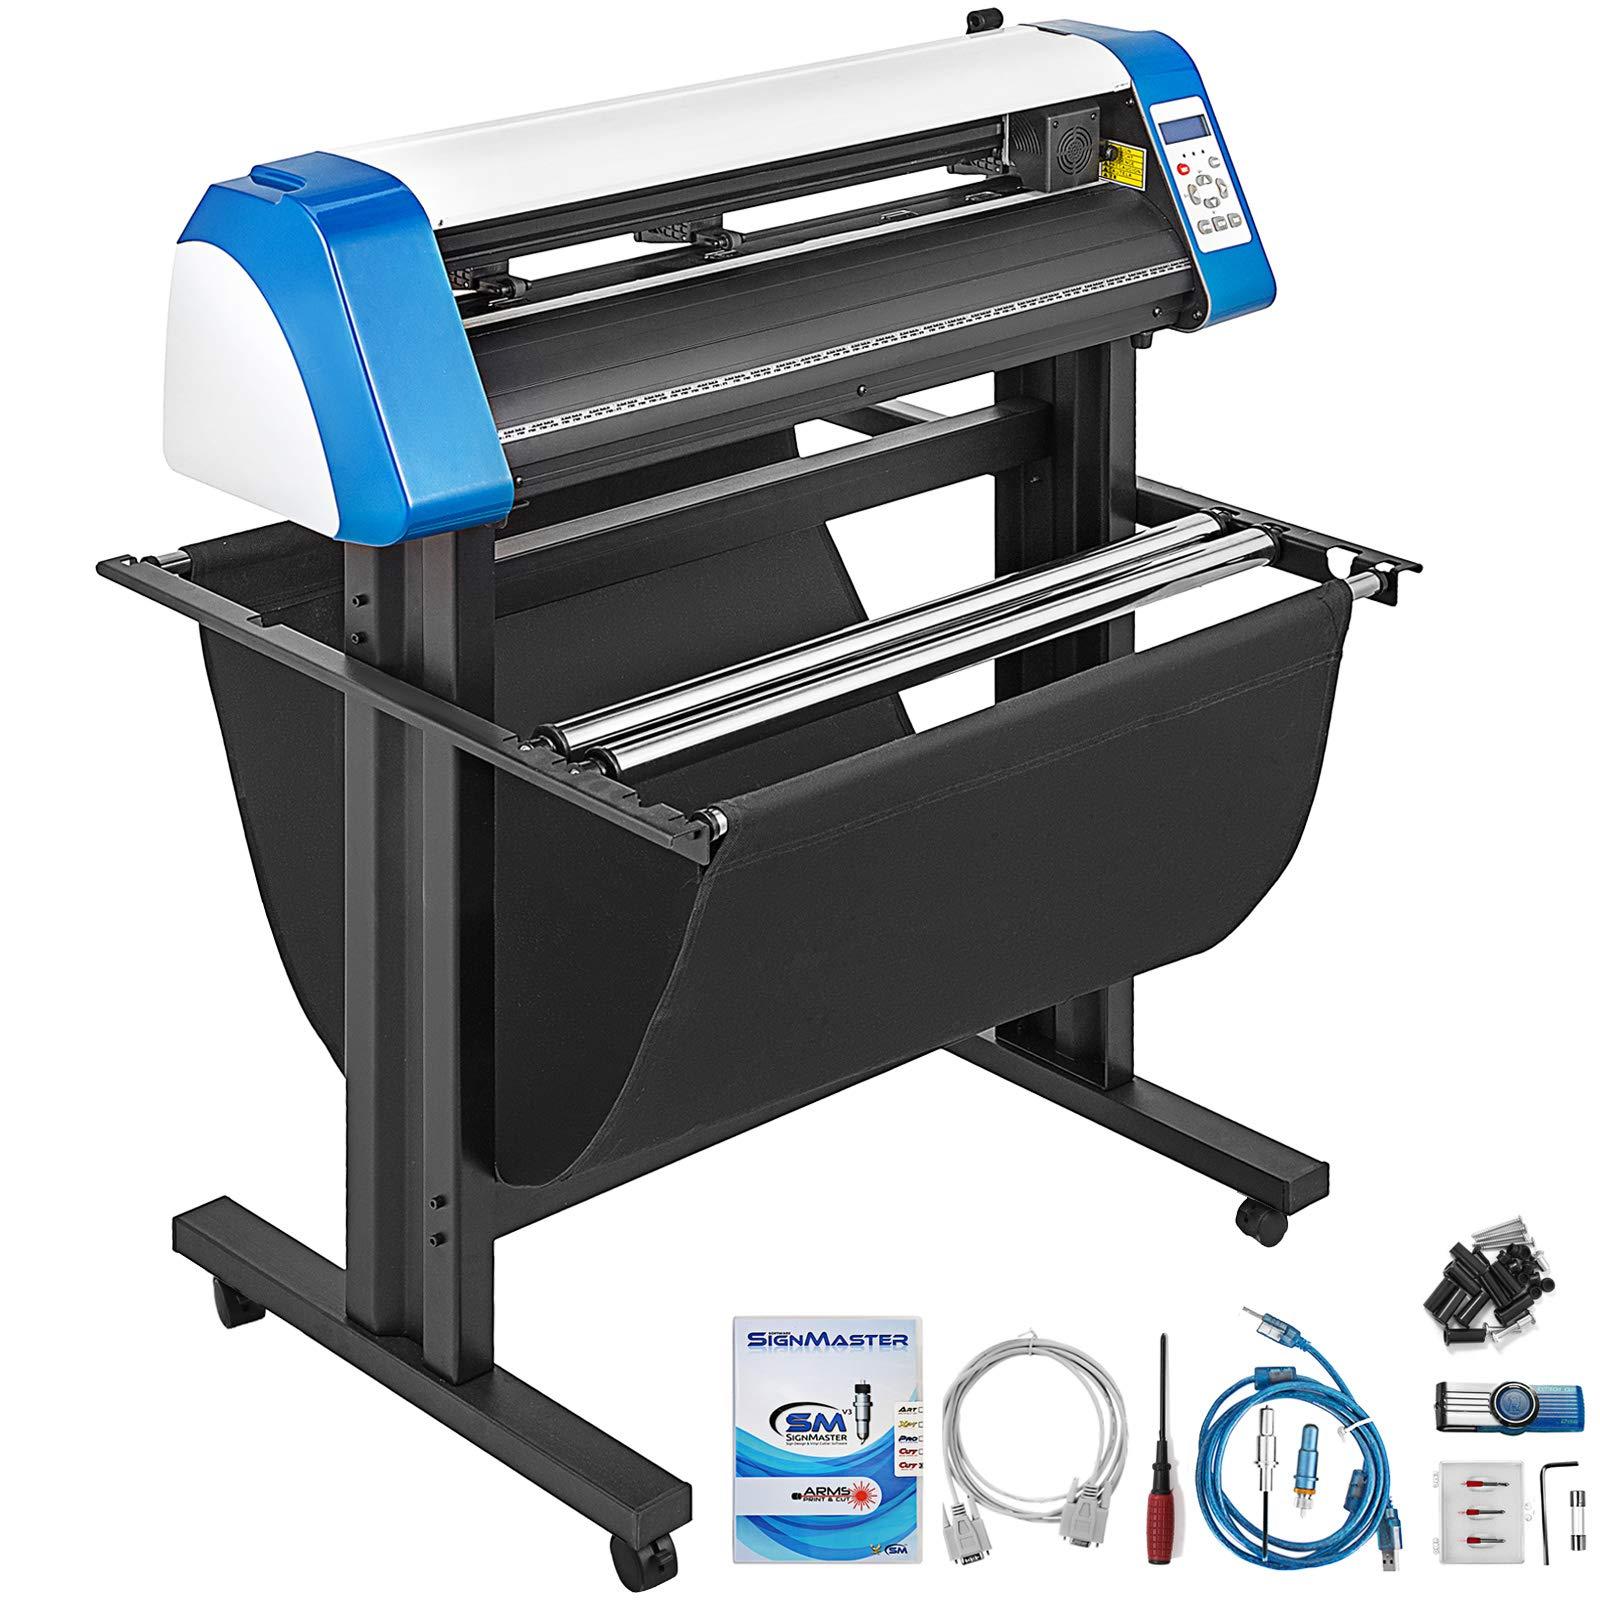 VEVOR Vinyl Cutter 28 Inch Vinyl Cutter Machine Semi-Automatic DIY Vinyl Printer Cutter Machine Manual Positioning Sign Cutting with Floor Stand & Signmaster Software